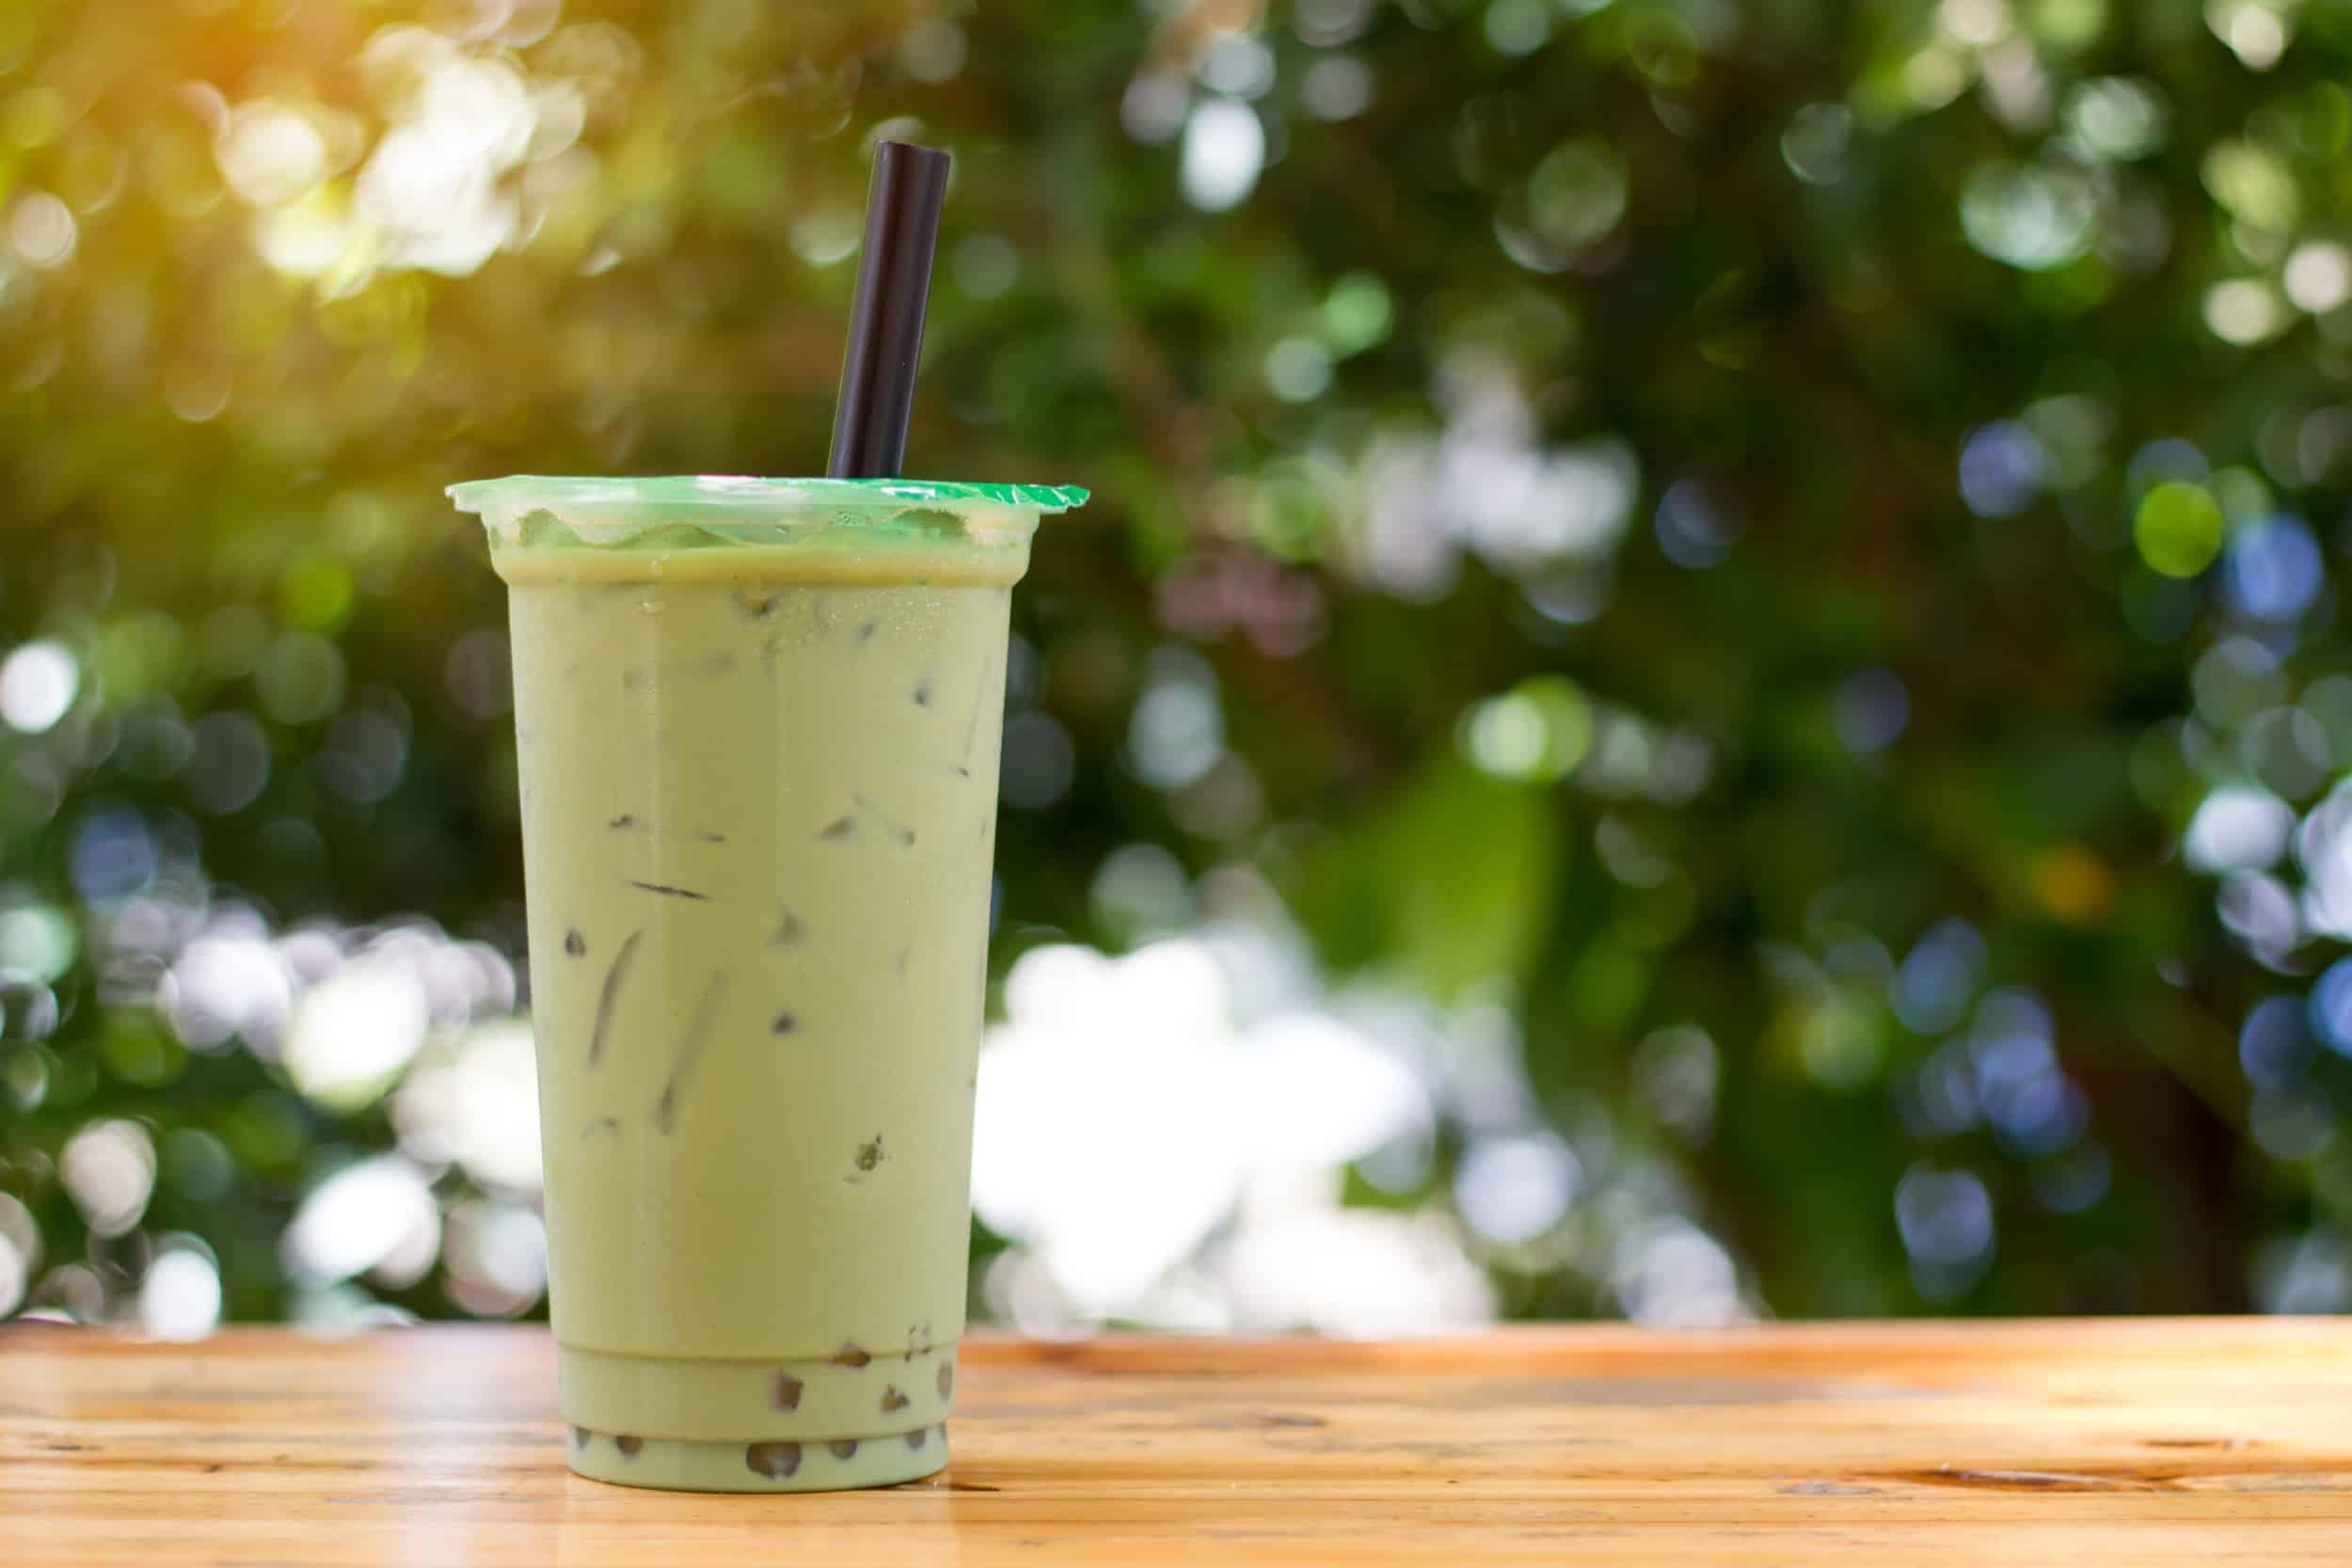 jasmine-milk-tea-5210282